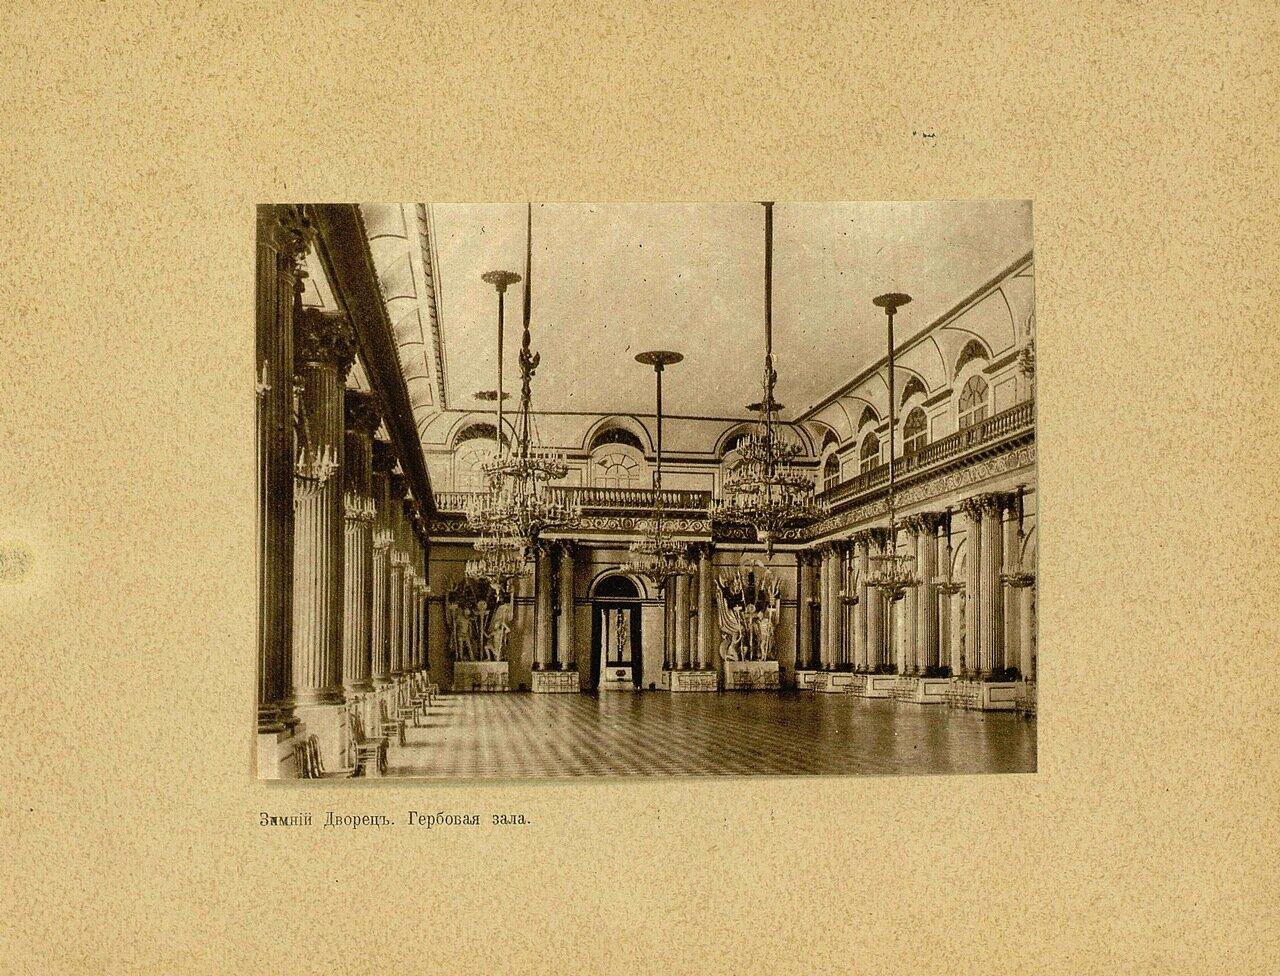 Гербовая зала